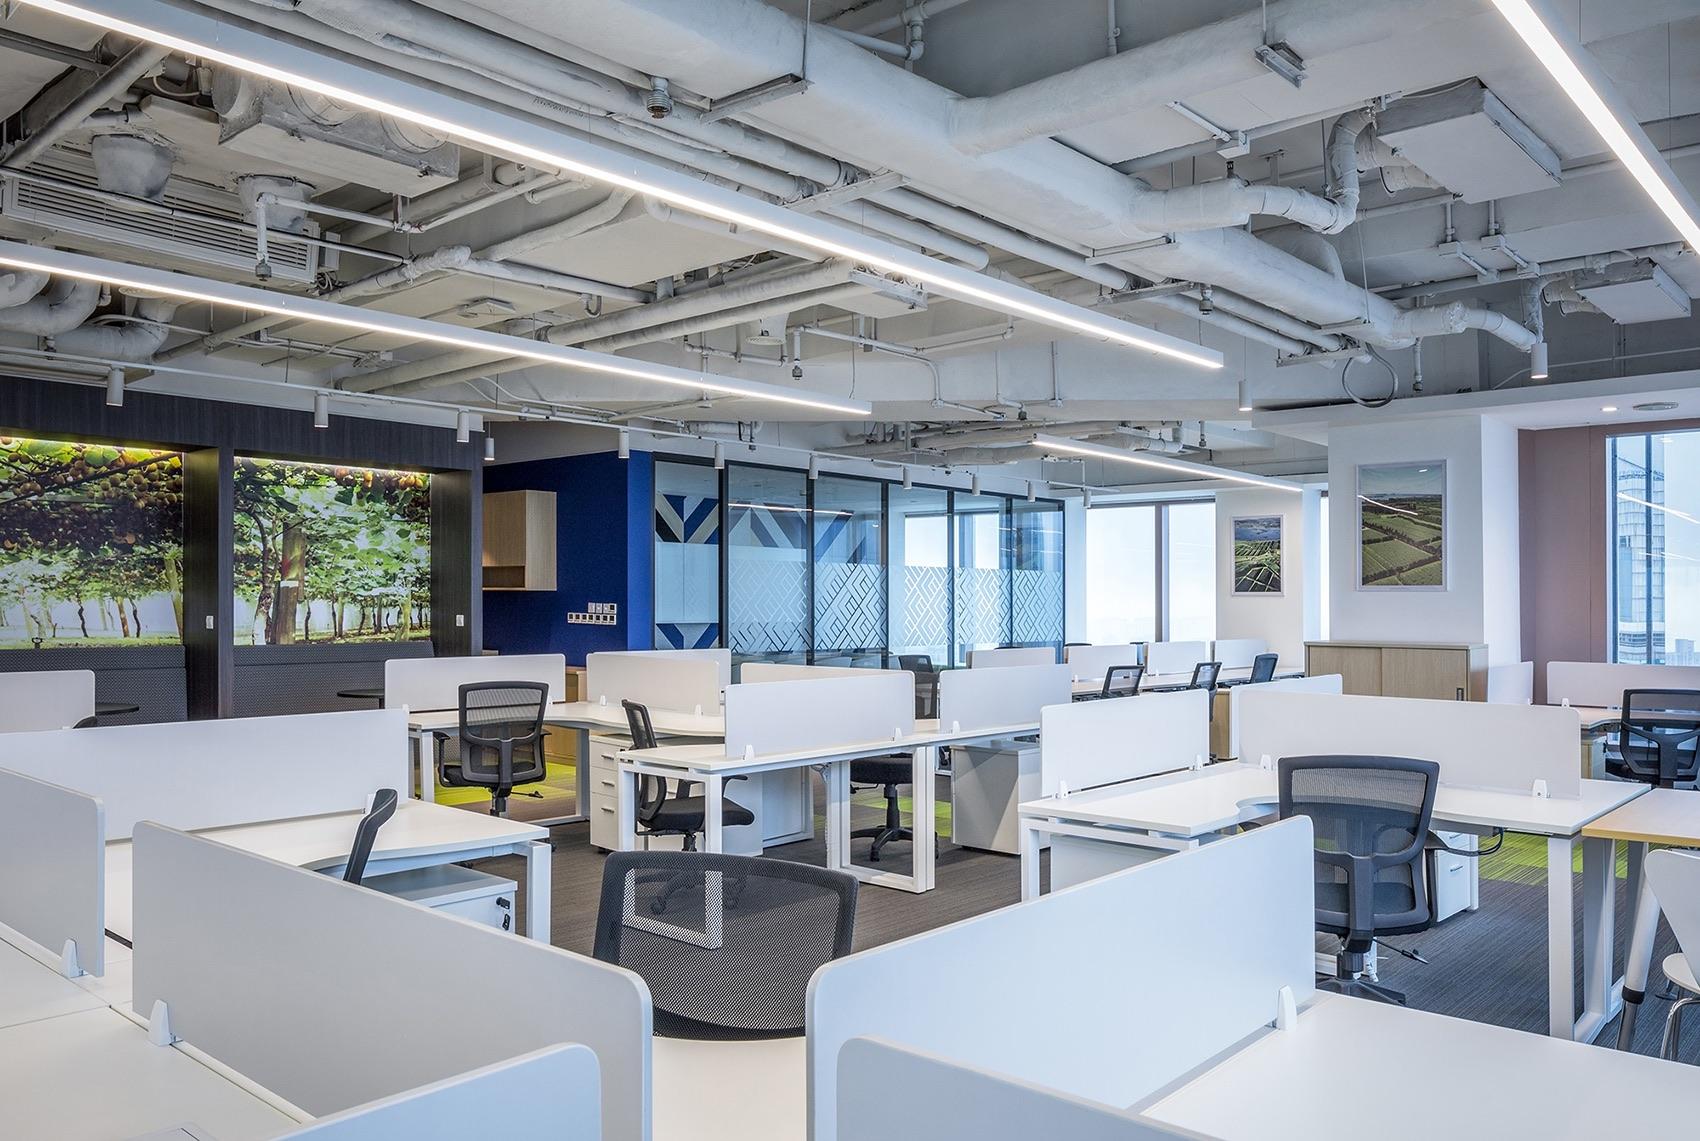 zespri-image-shanghai-office-5